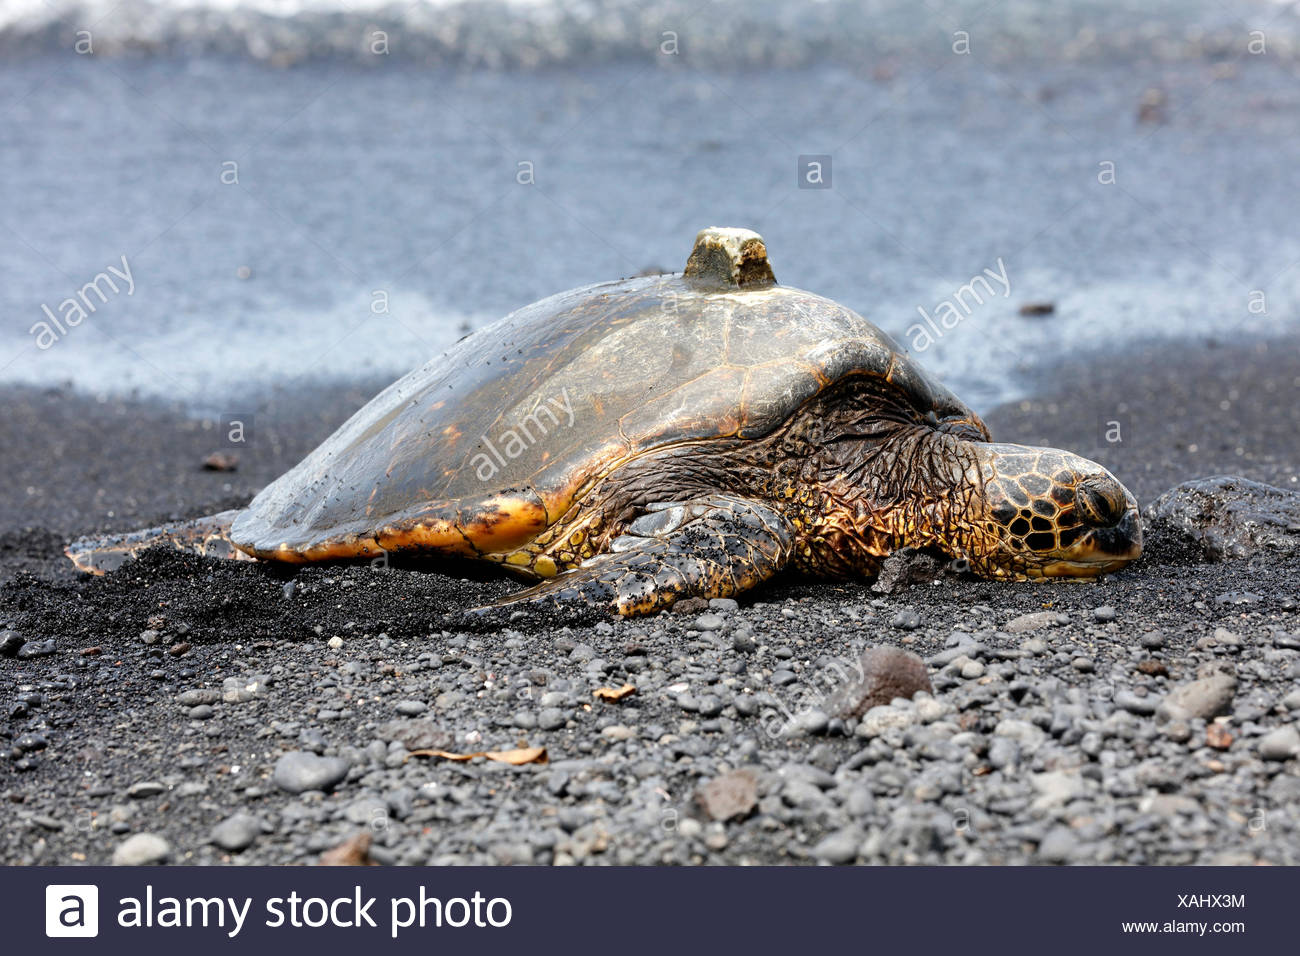 Tortuga Verde (Chelonia mydas) con receptor GPS en shell, playa de arena negra, Punalu'u, Big Island, Hawaii, EE.UU. Imagen De Stock